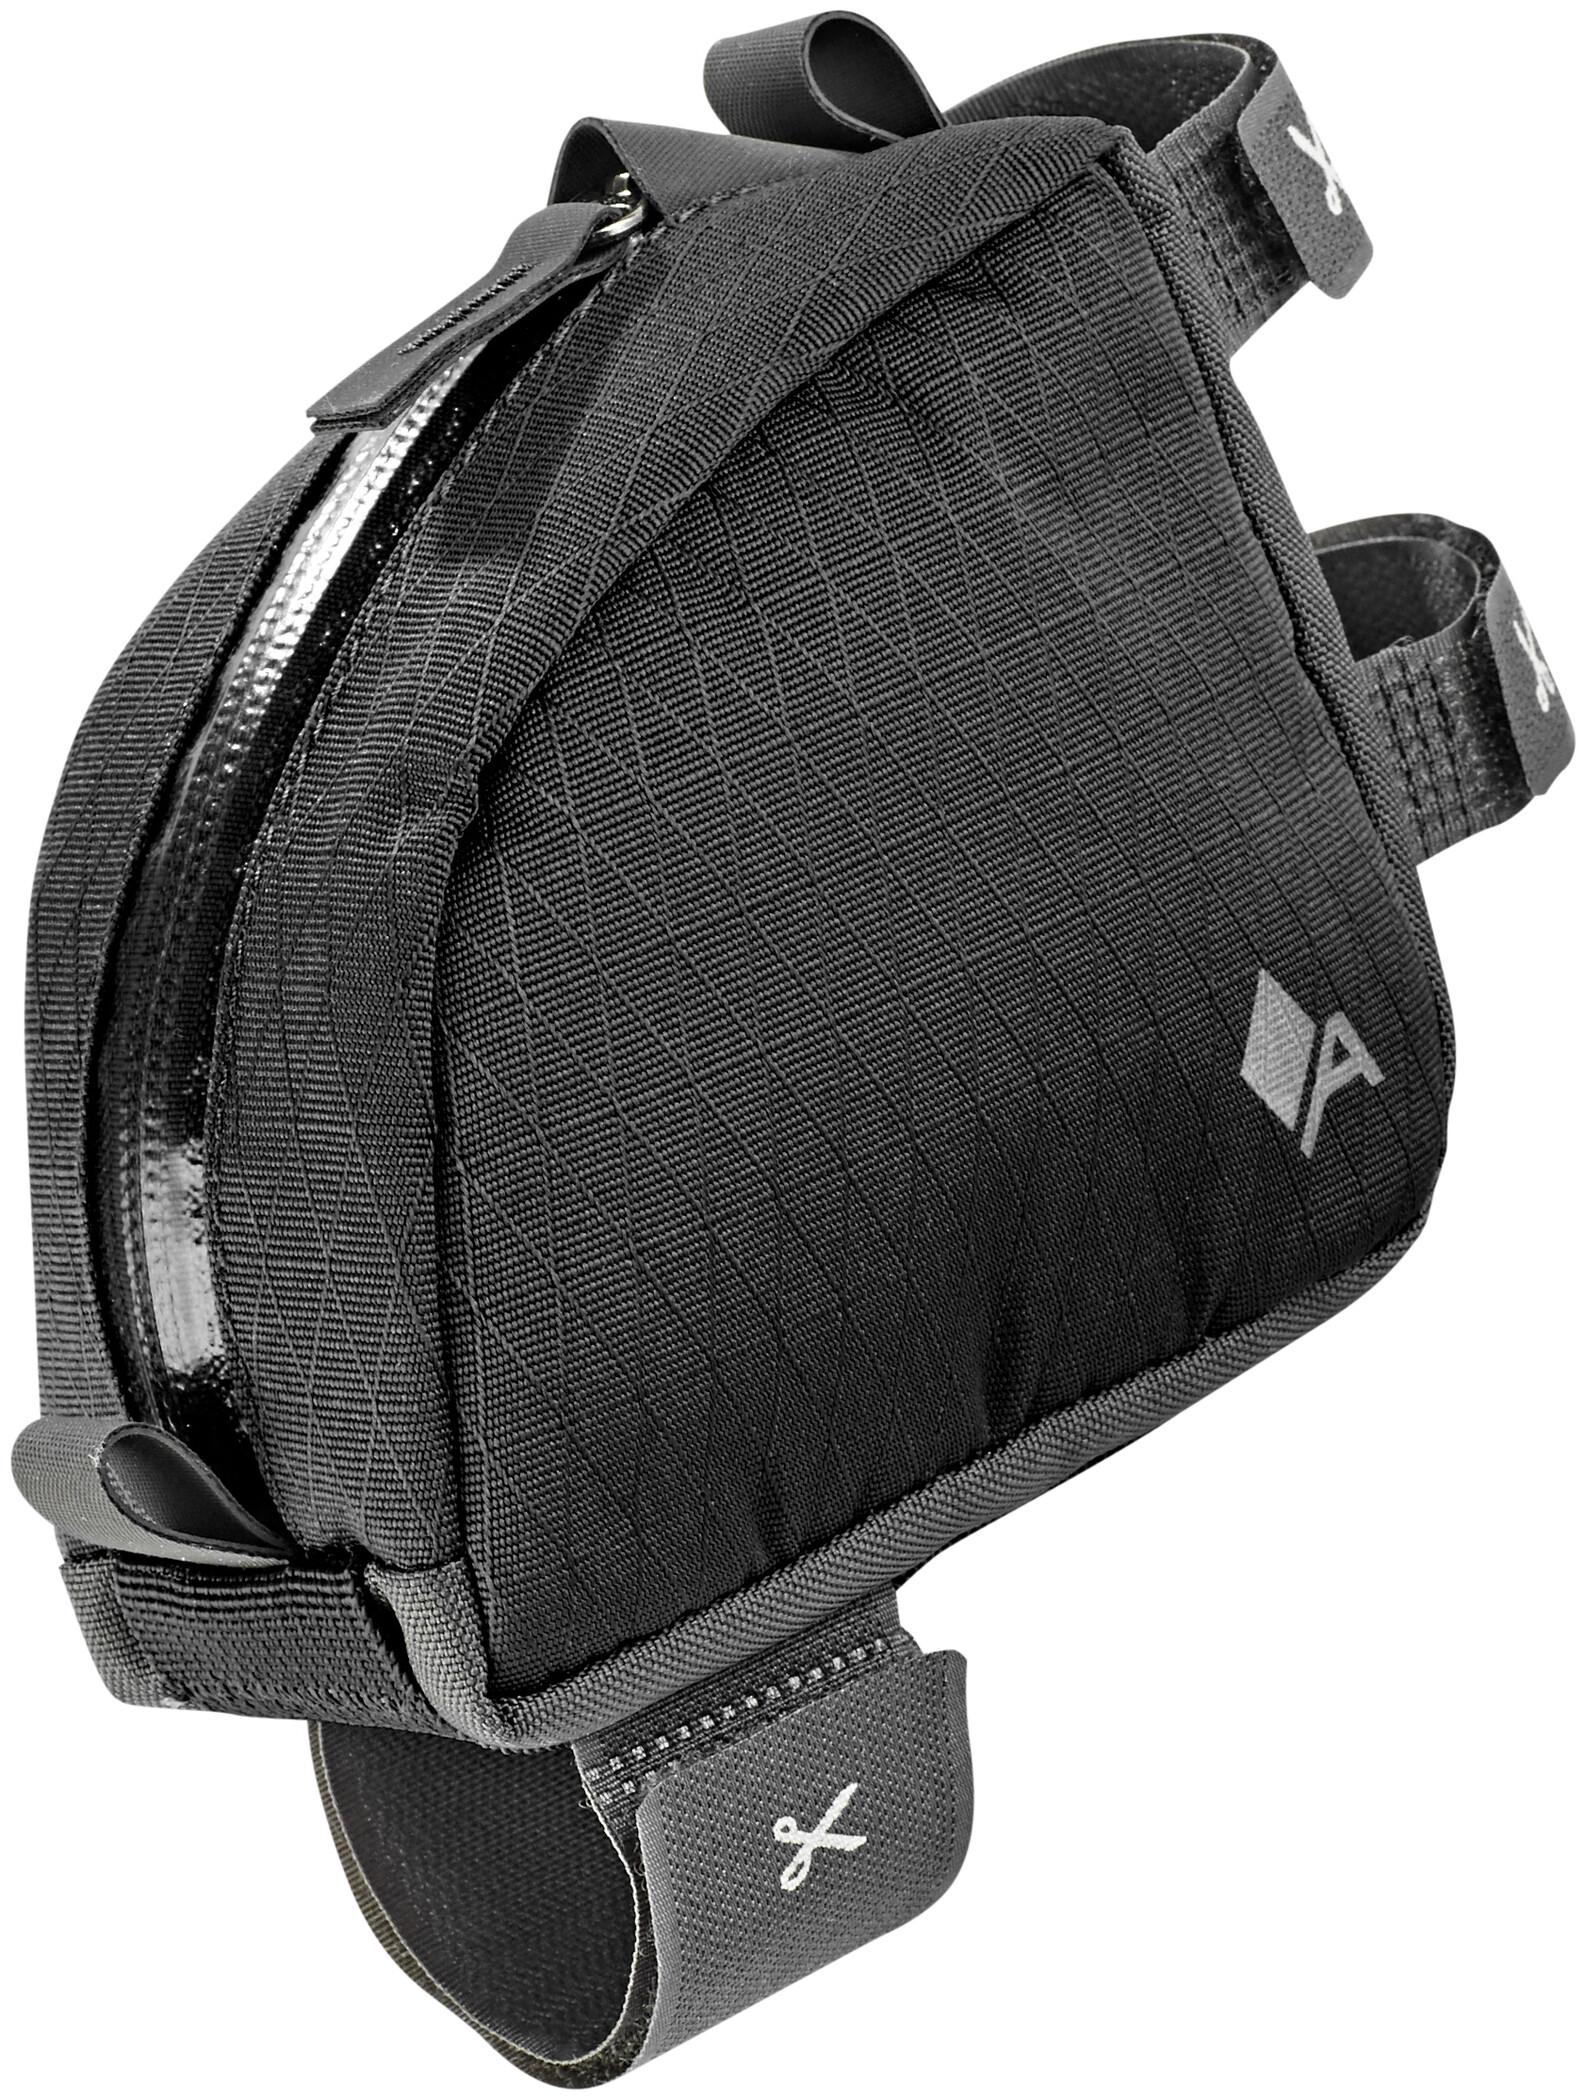 Acepac Tube Bag, black   Saddle bags